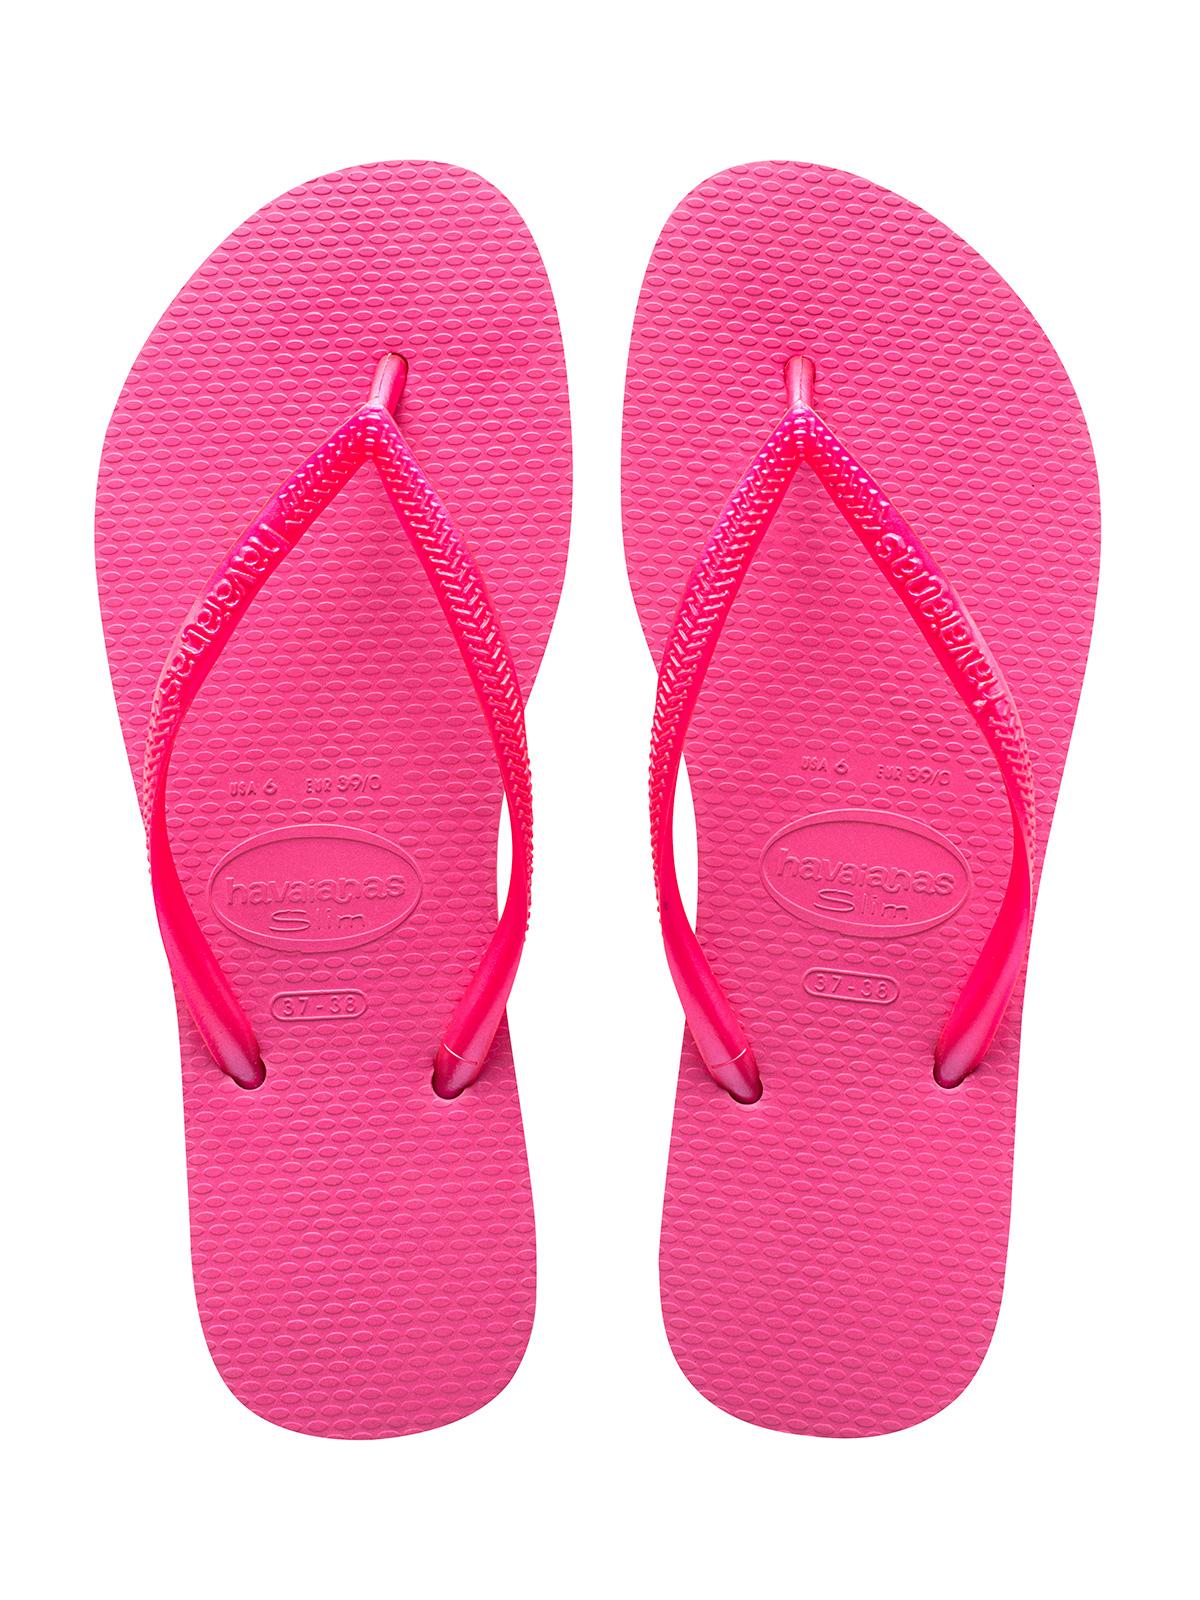 Resultado de imagem para havaianas cor de rosa